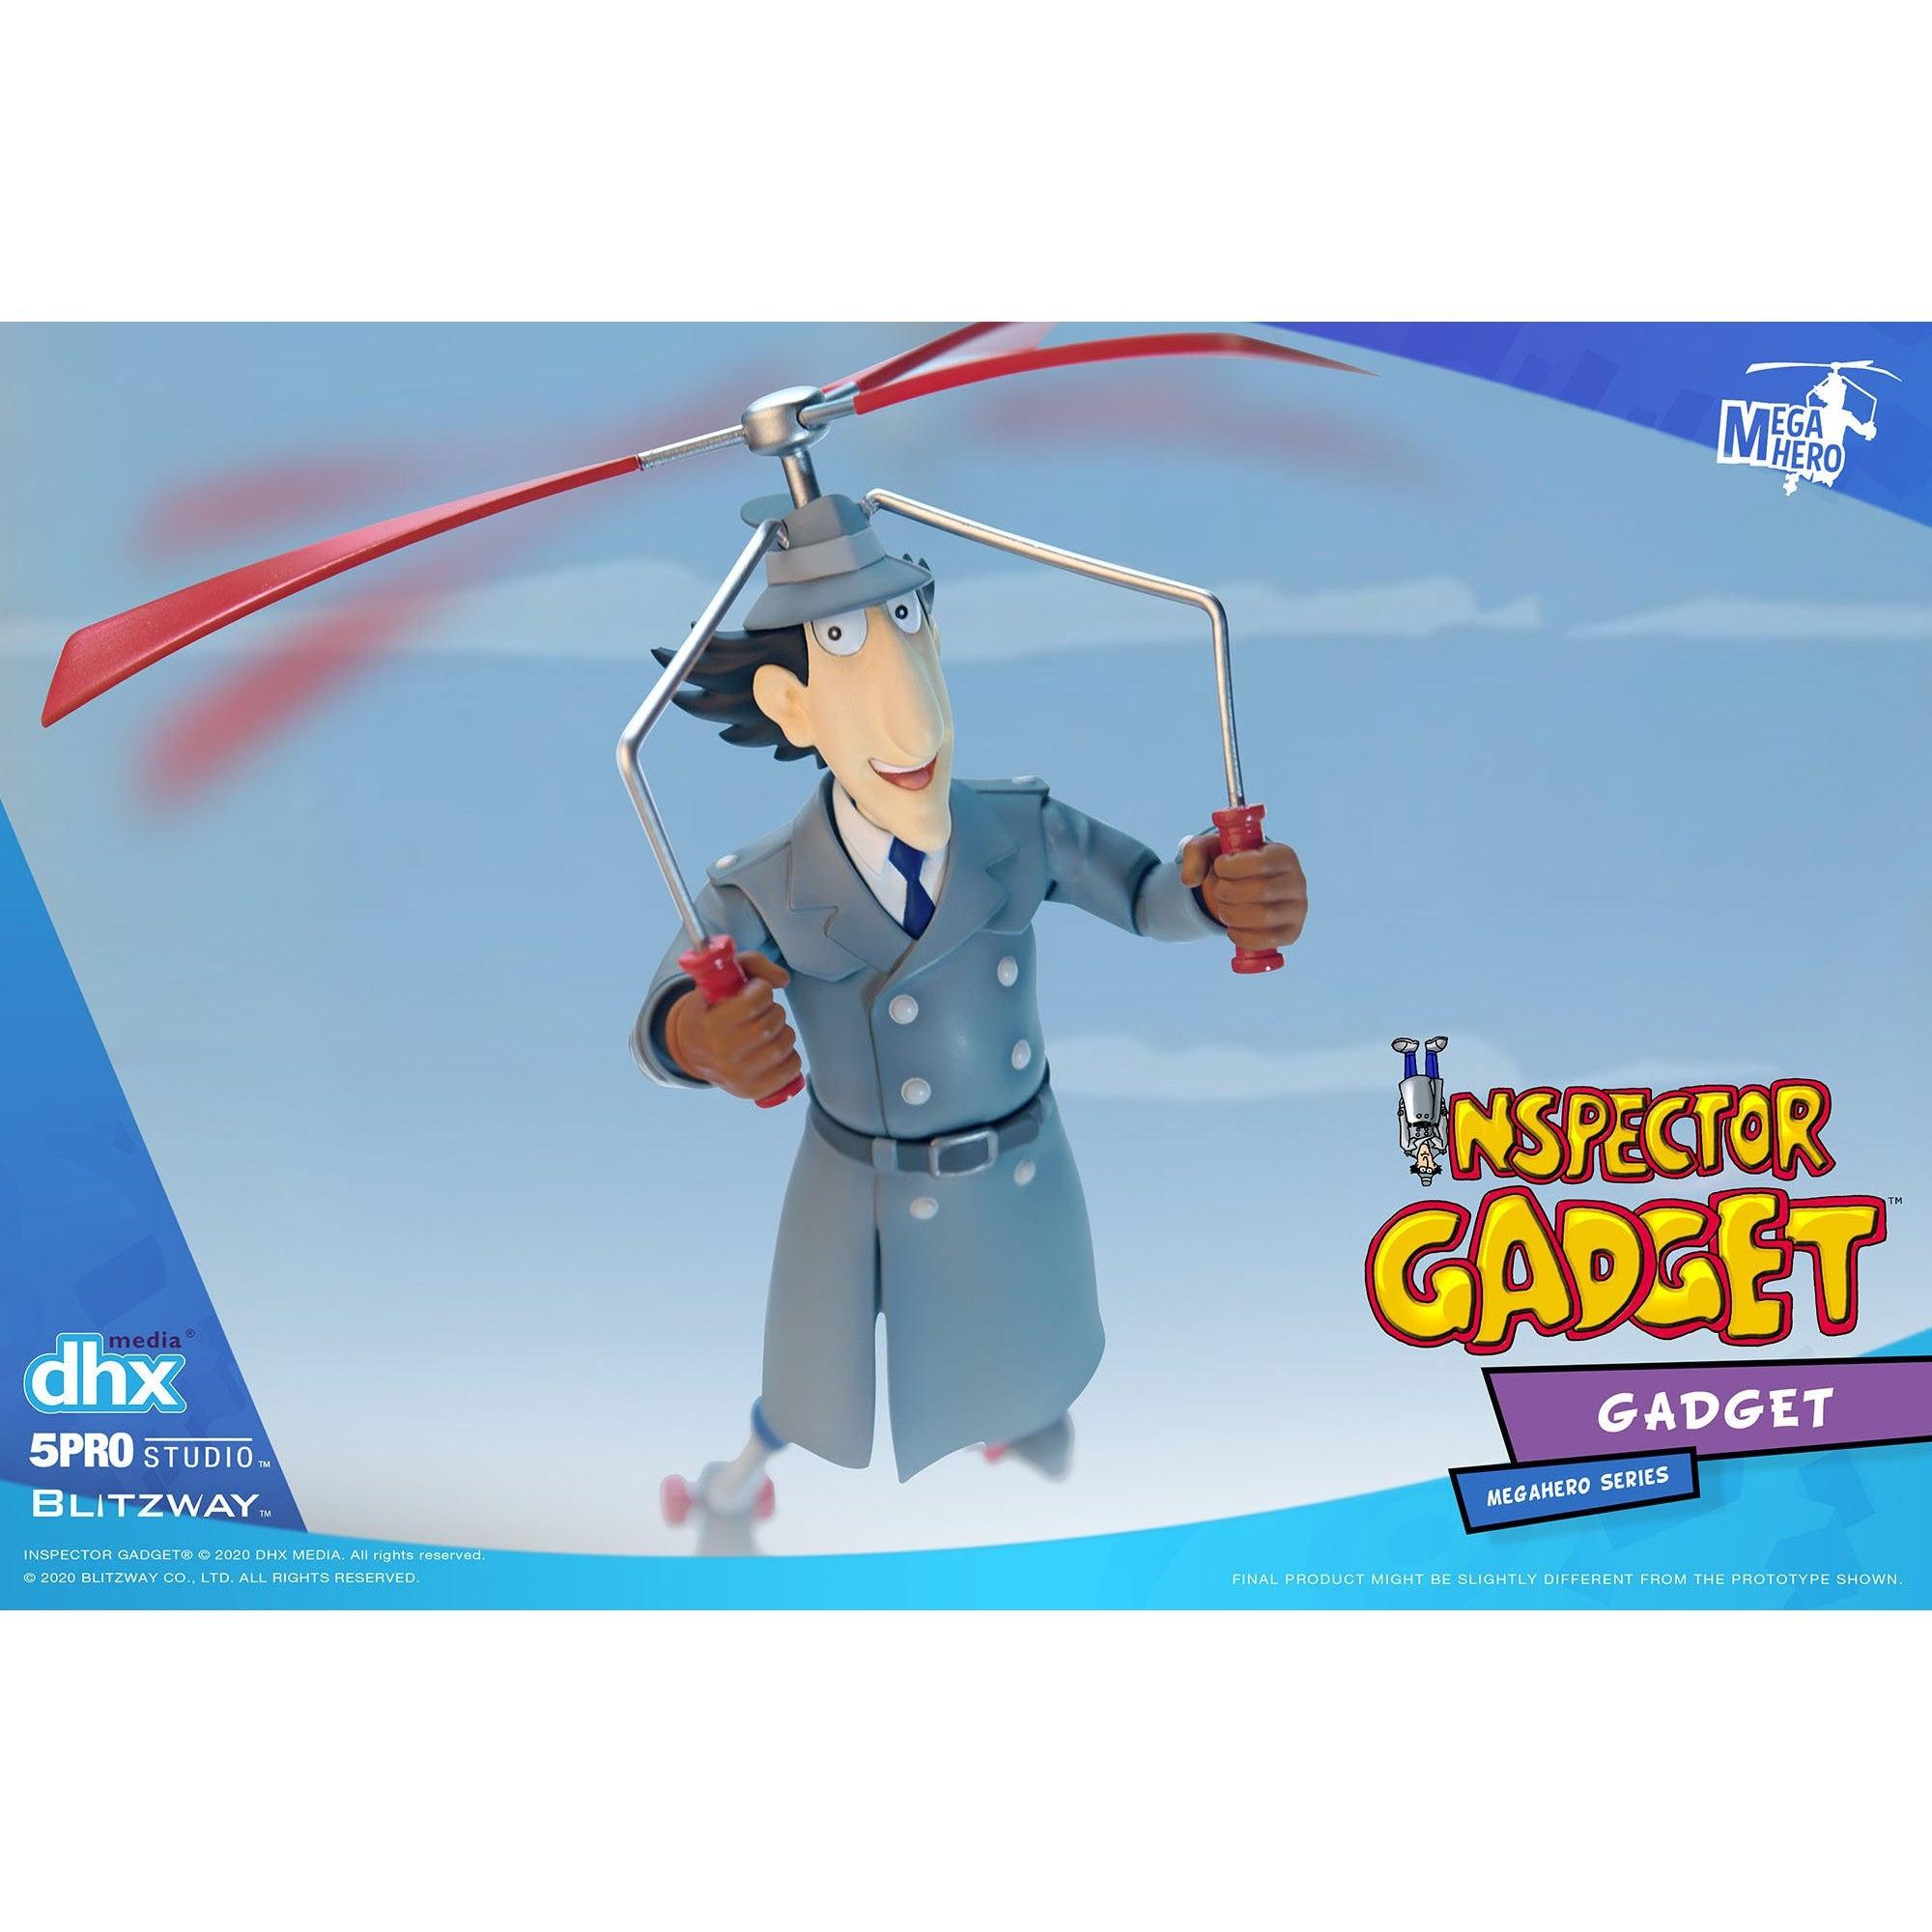 Image of Inspector Gadget MEGAHERO Series - Inspector Gadget 1:12 Scale Action Figure - Q4 2020